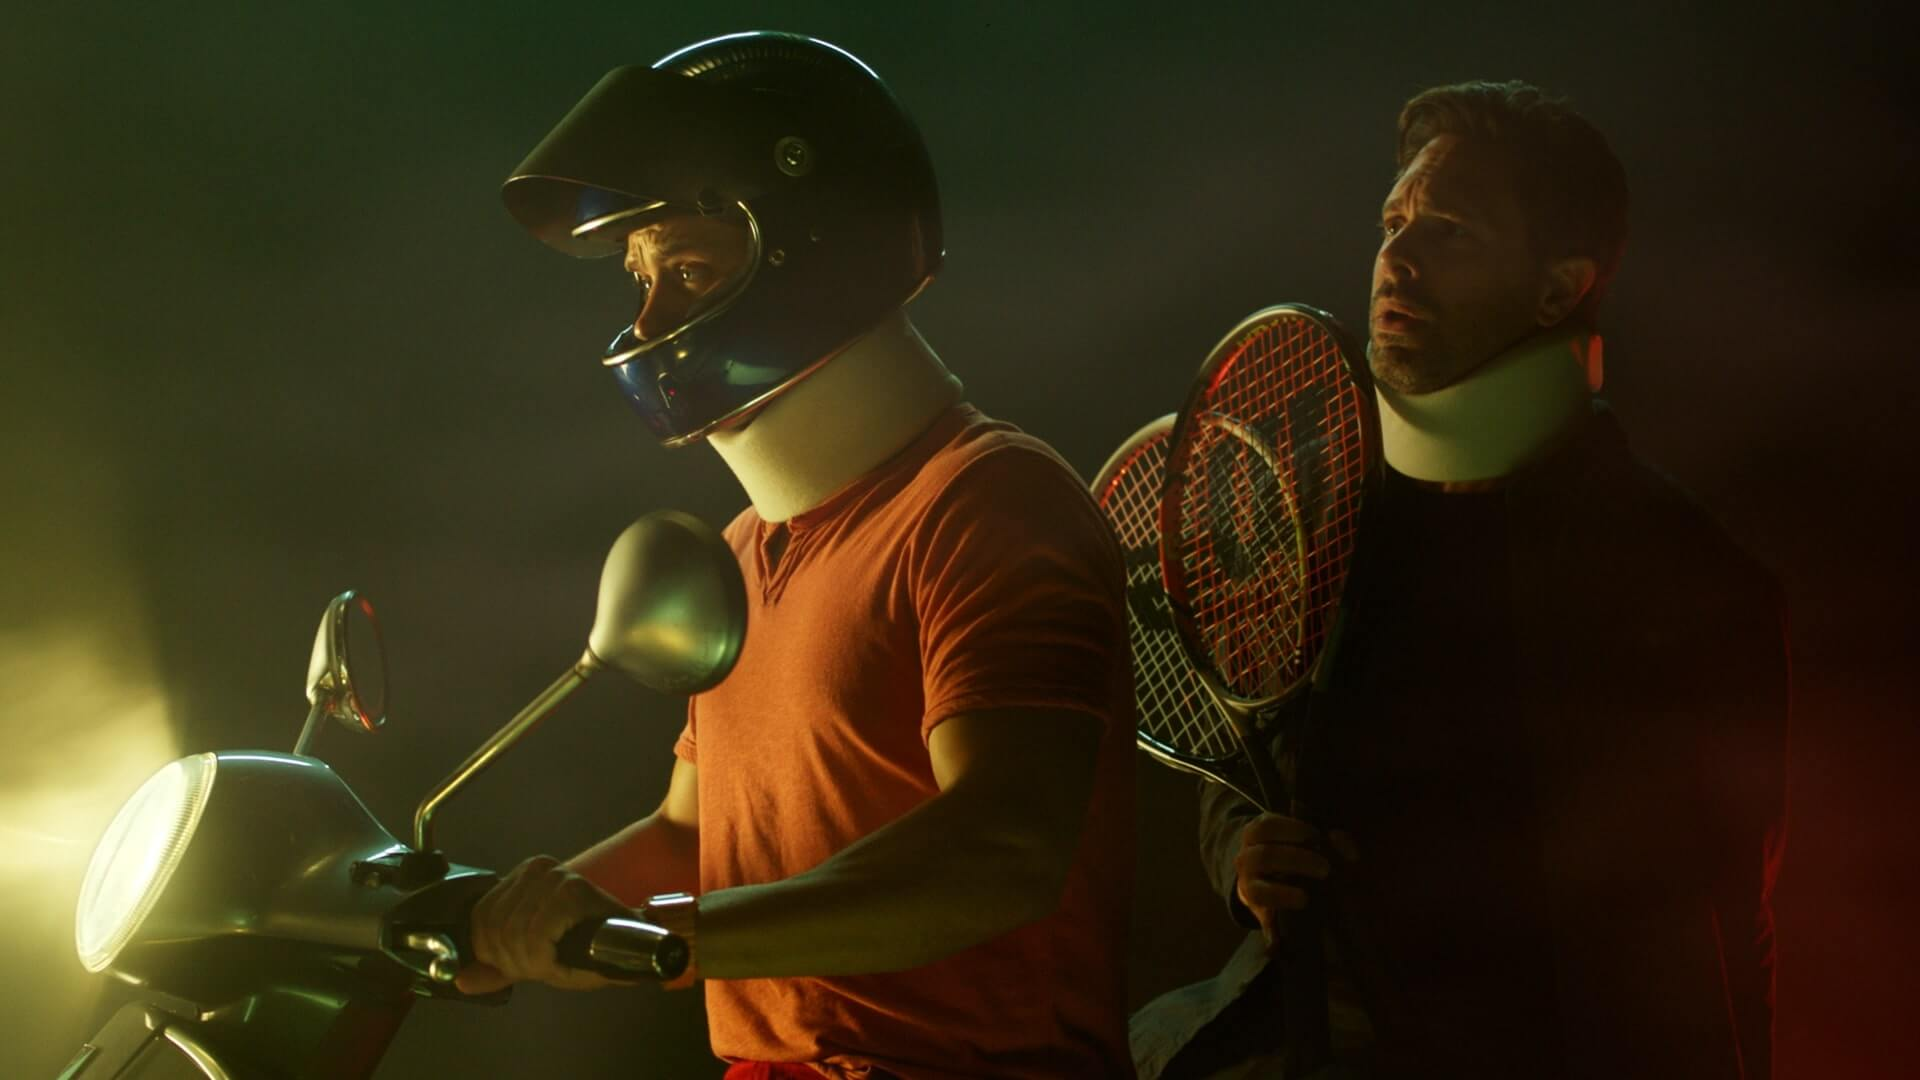 Jake Robinson and Thomas Sadoski on a motorbike in 'The Mimic'